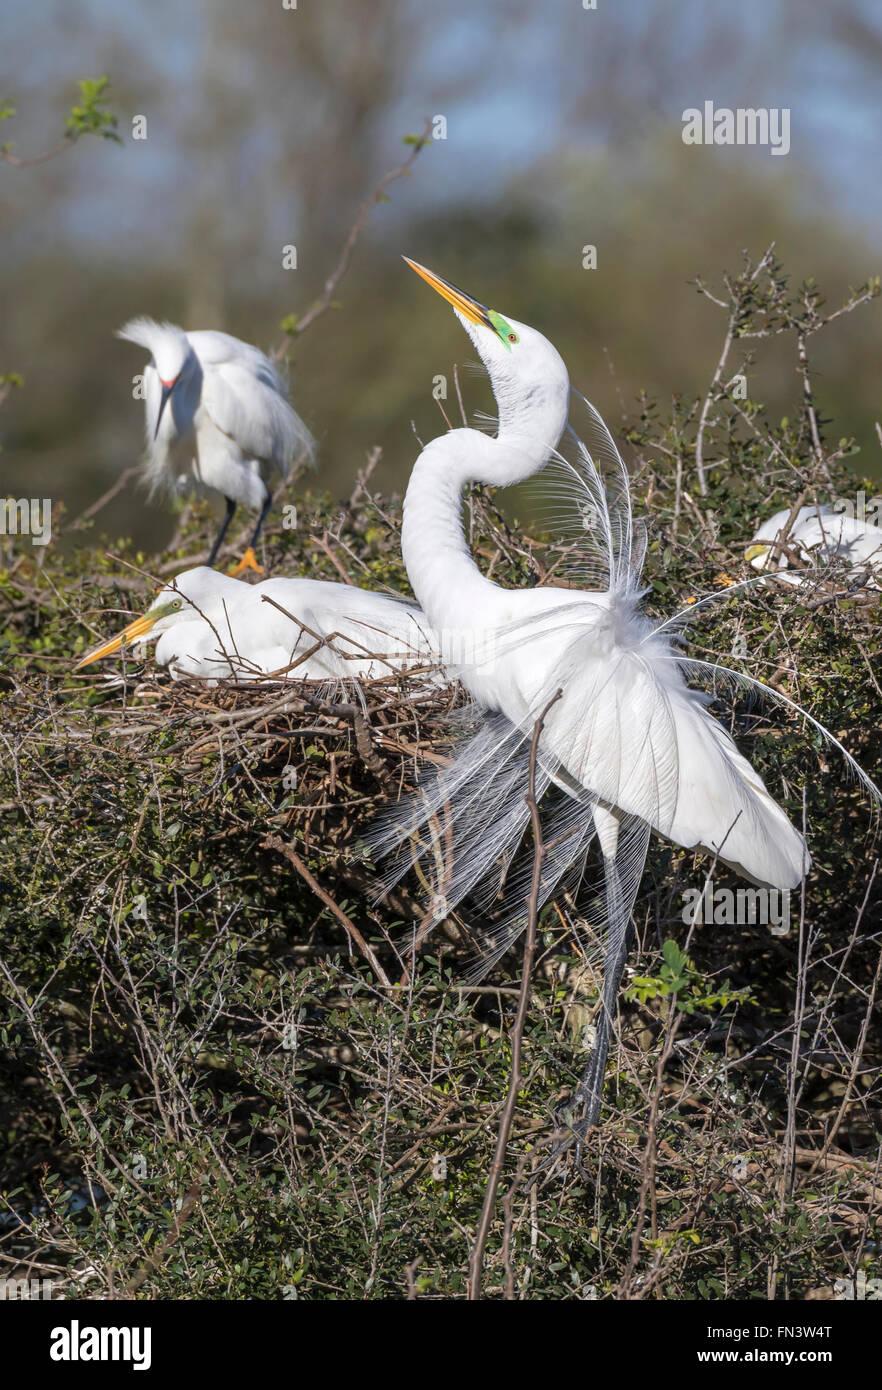 Great egret (Ardea alba) displaying the breeding plumage at rookery, High Island, Texas, USA - Stock Image